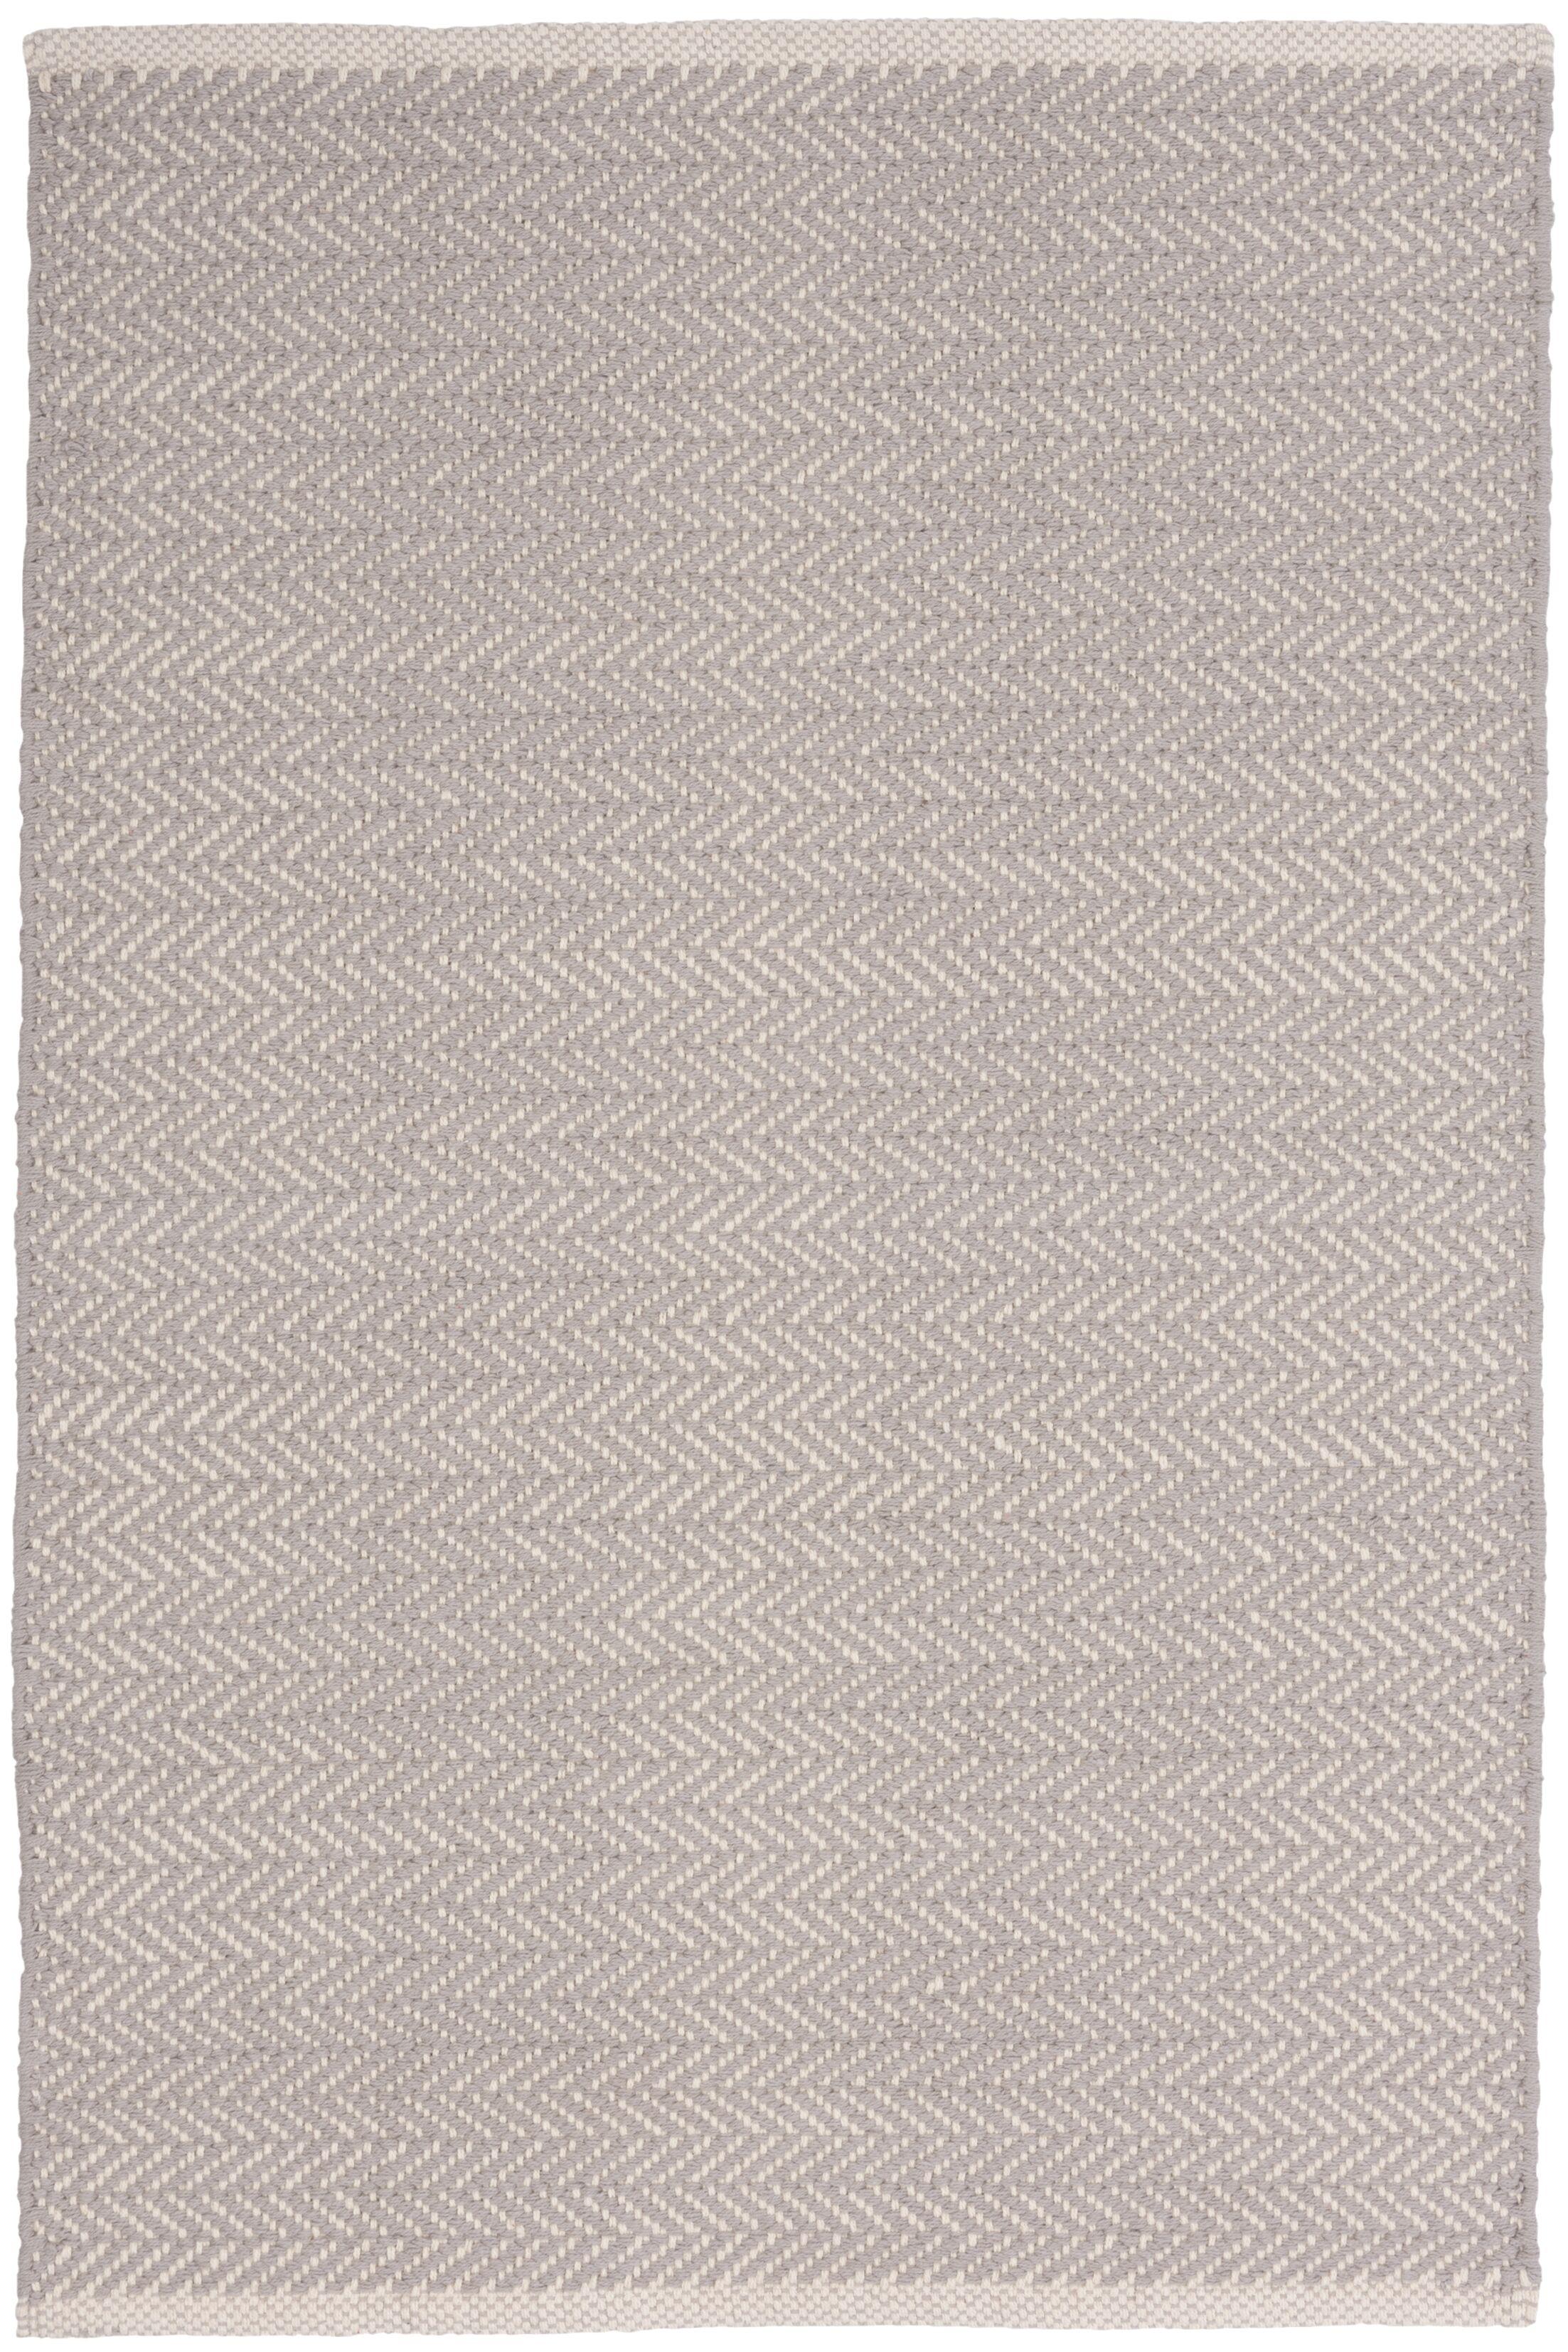 Herringbone Hand-Woven Grey Area Rug Rug Size: Rectangle 6' x 9'